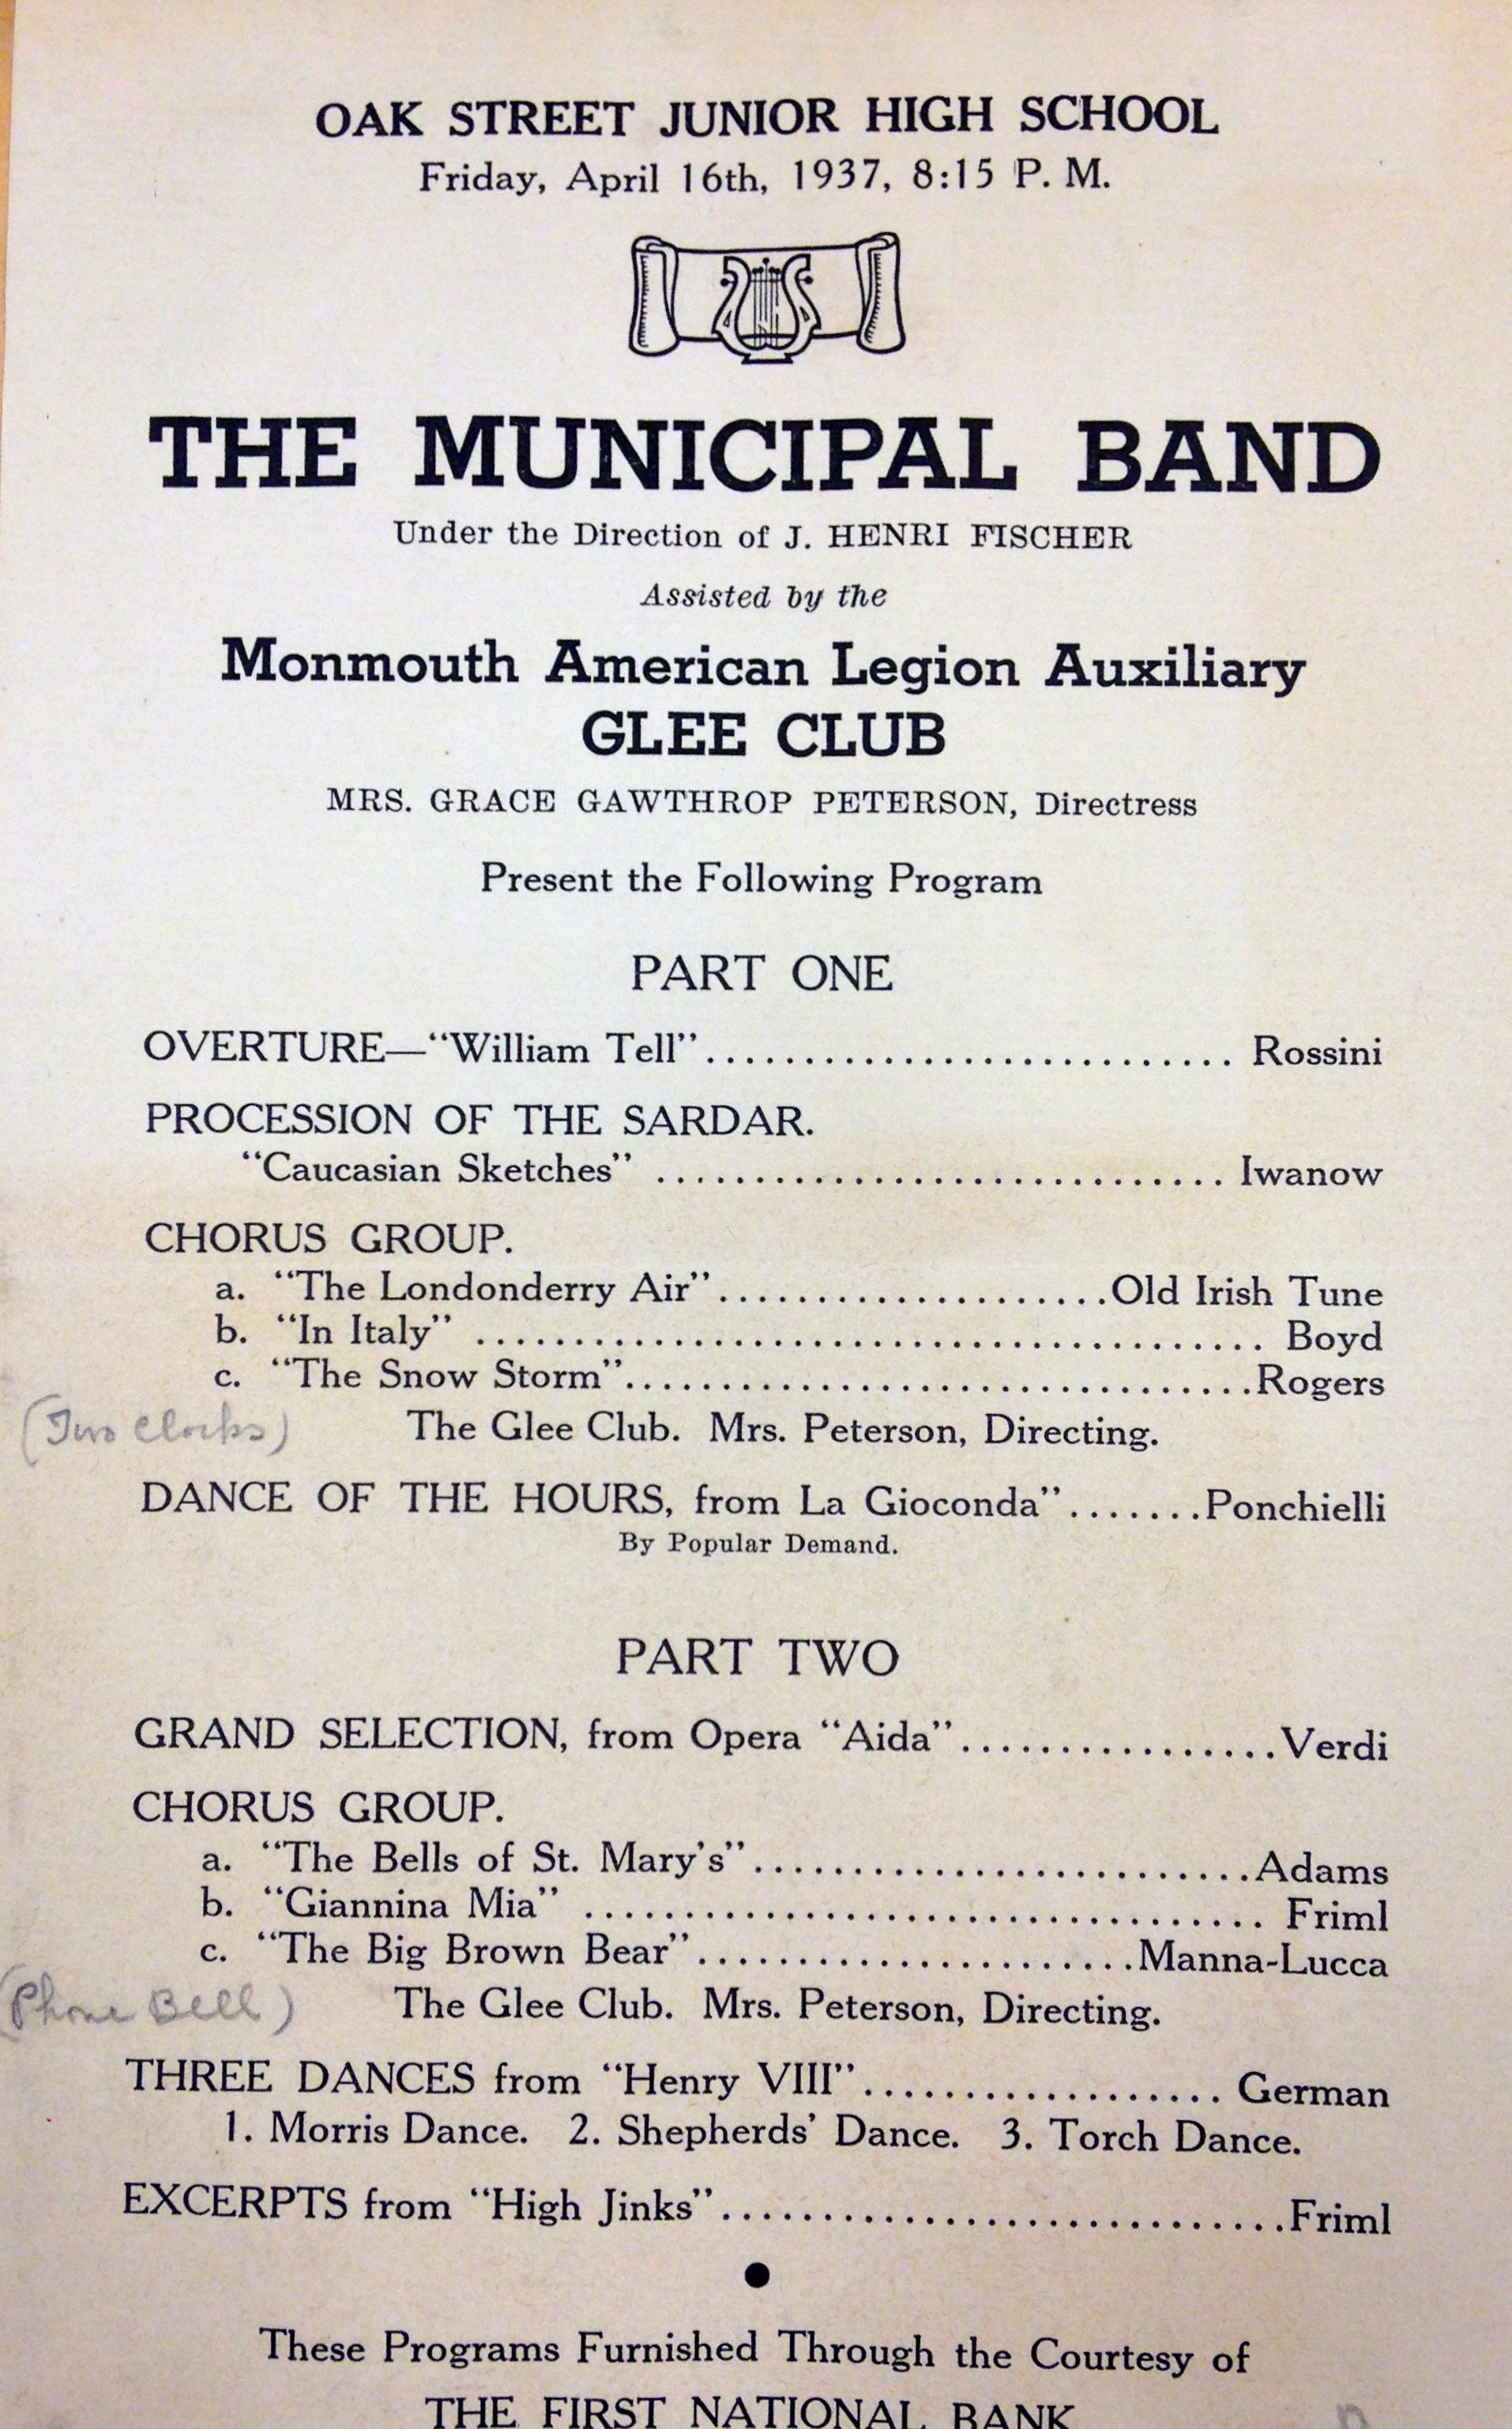 Monmouth American Legion Auxiliary Glee Club